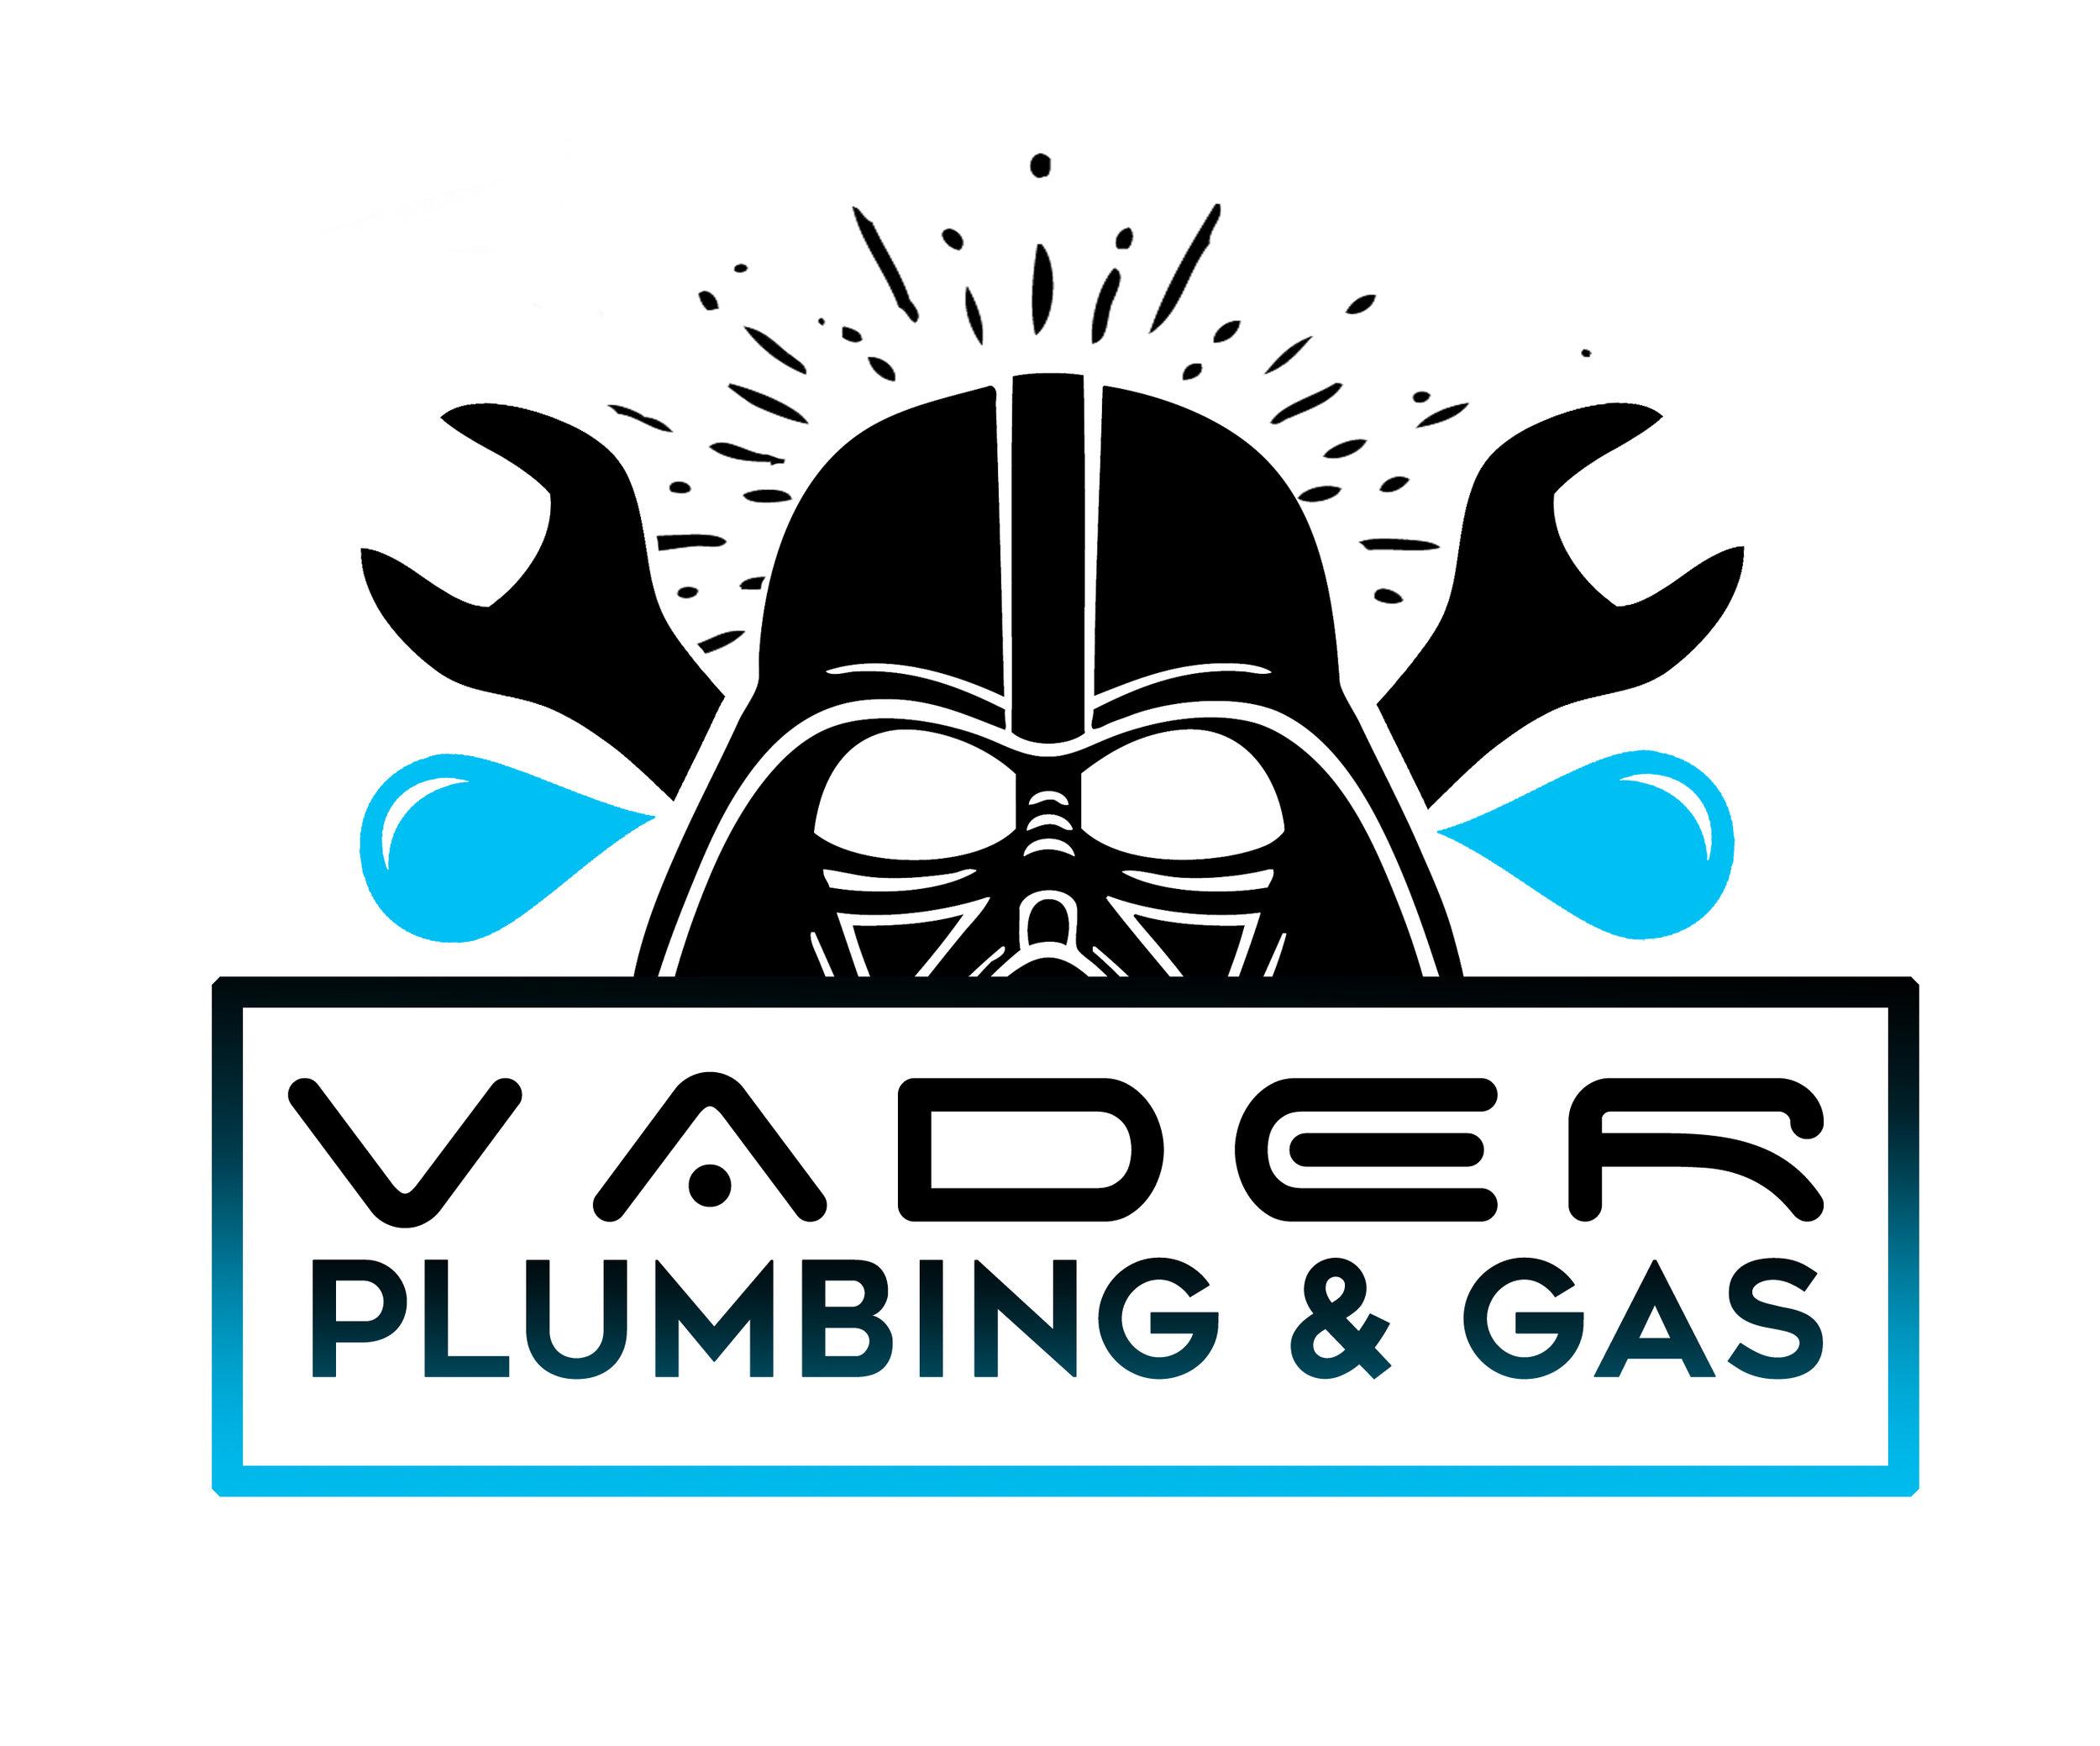 vader plumbing (1).jpg